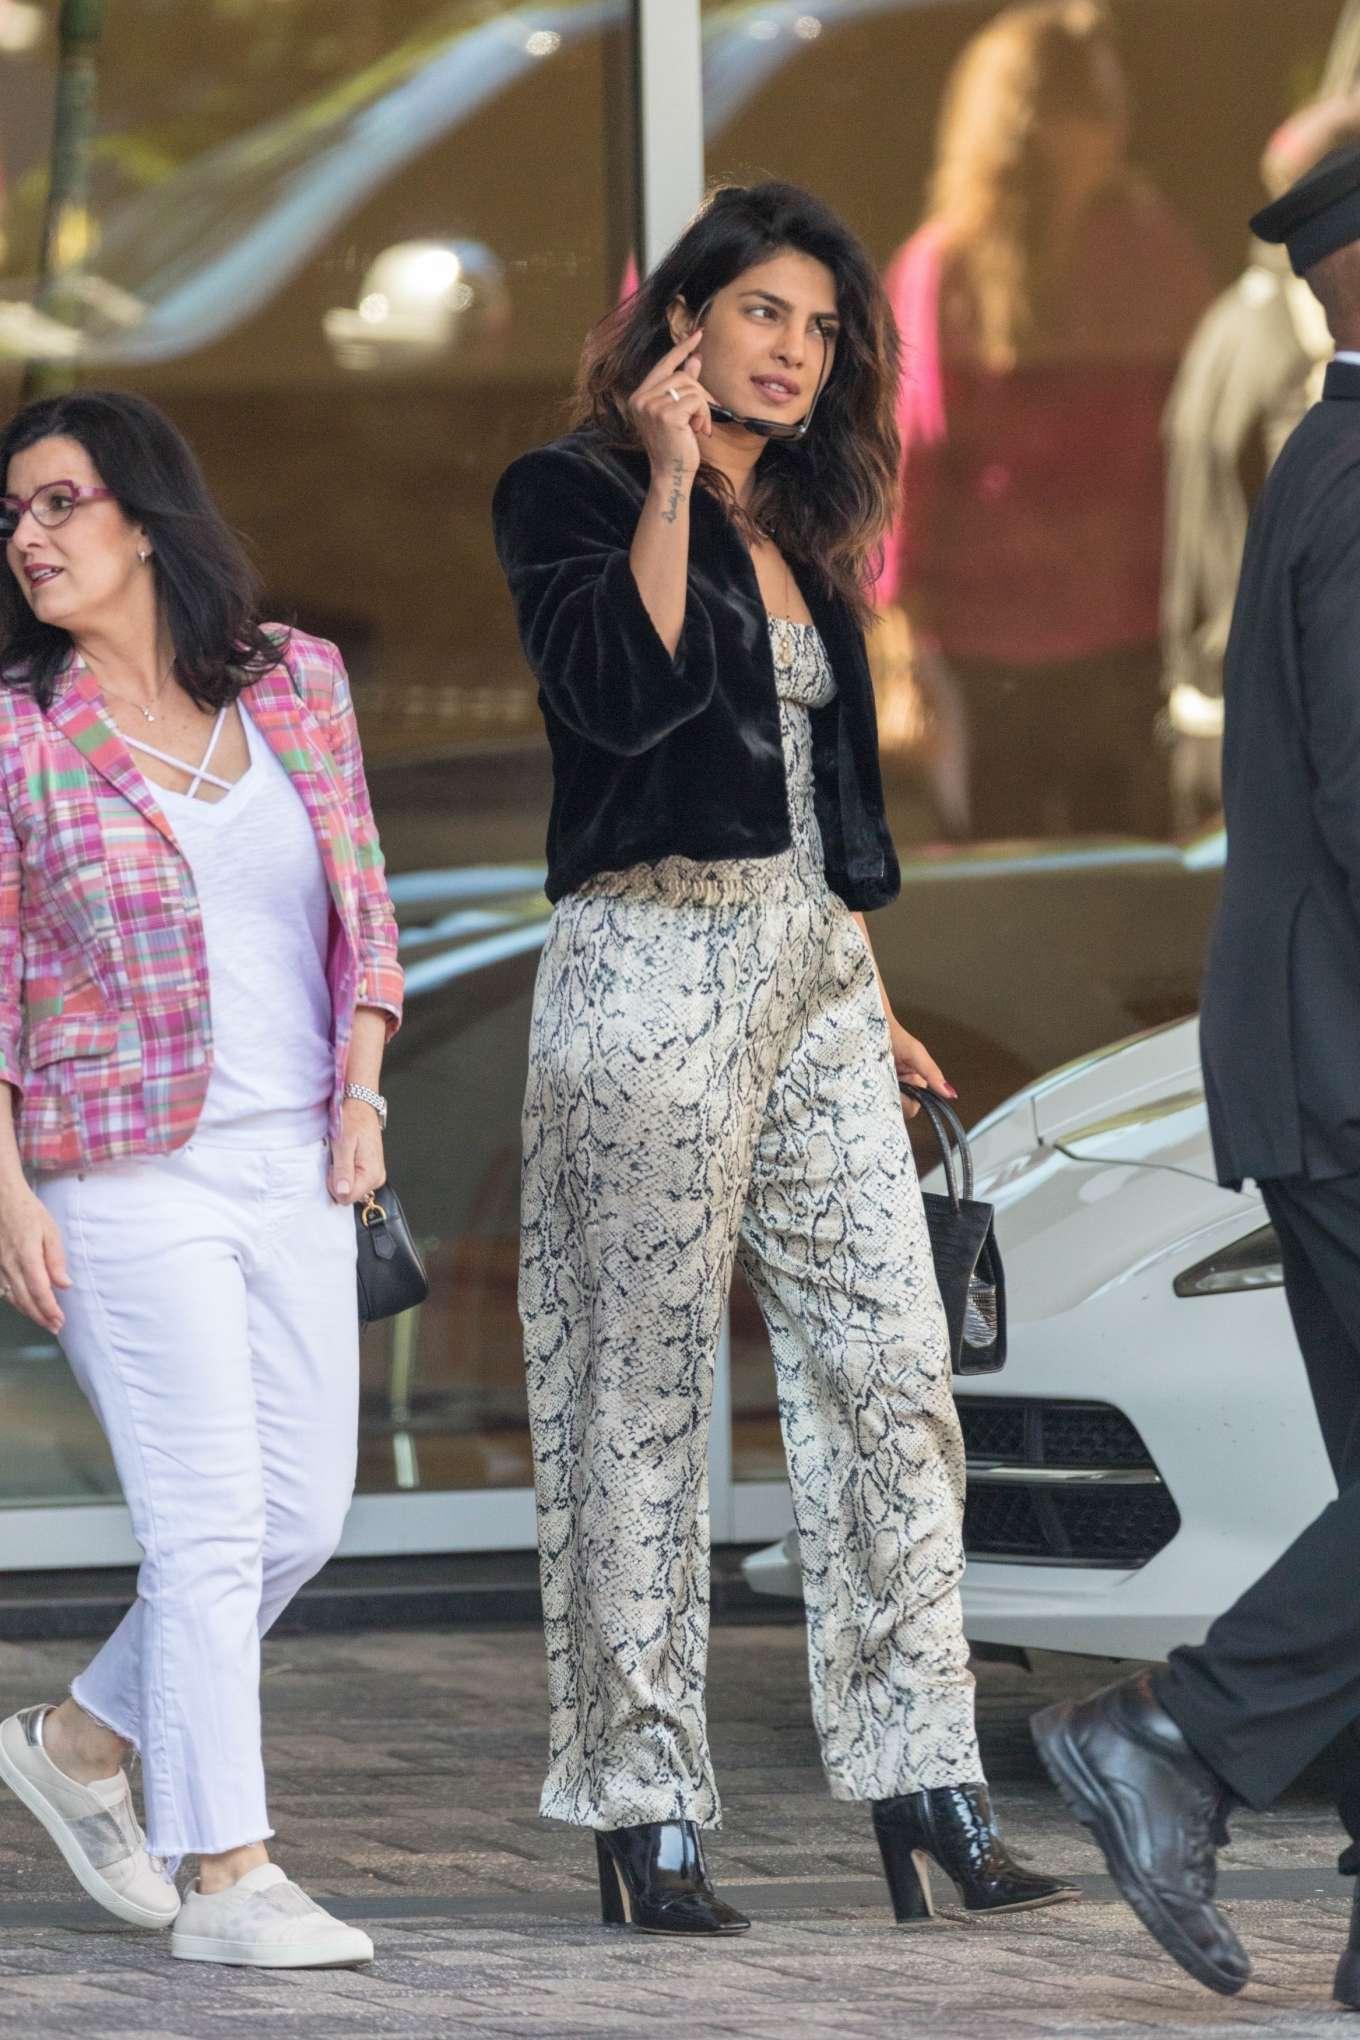 Priyanka Chopra 2019 : Priyanka Chopra: Head out to dinner in Atlanta -02